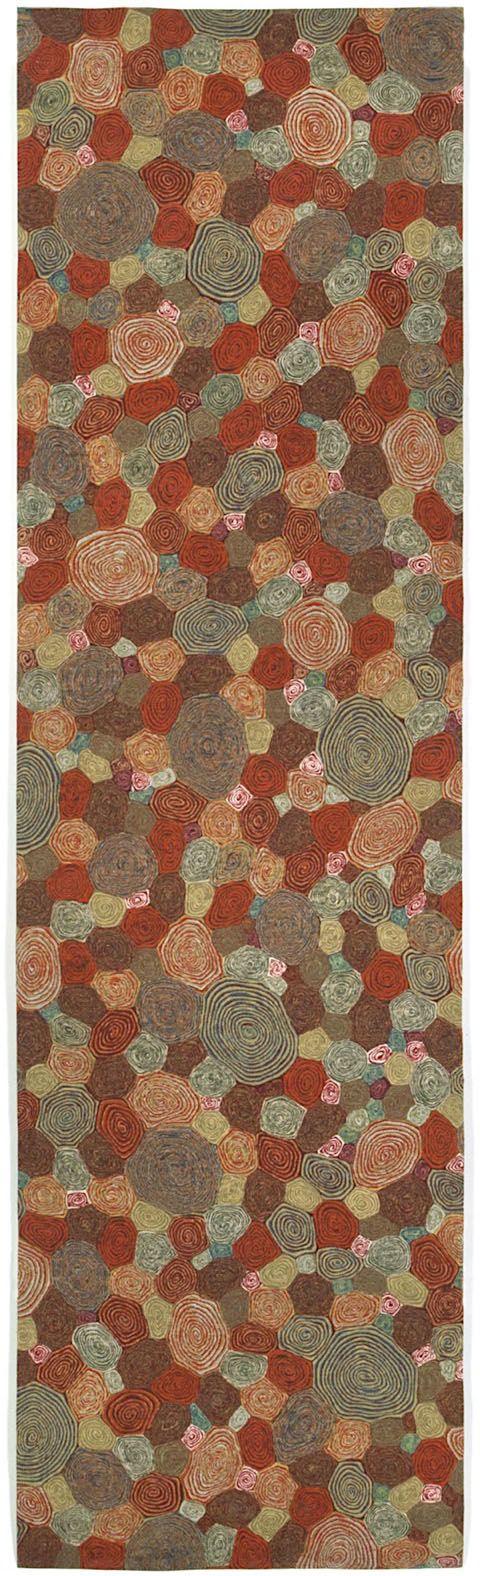 trans ocean visions iii contemporary area rug collection